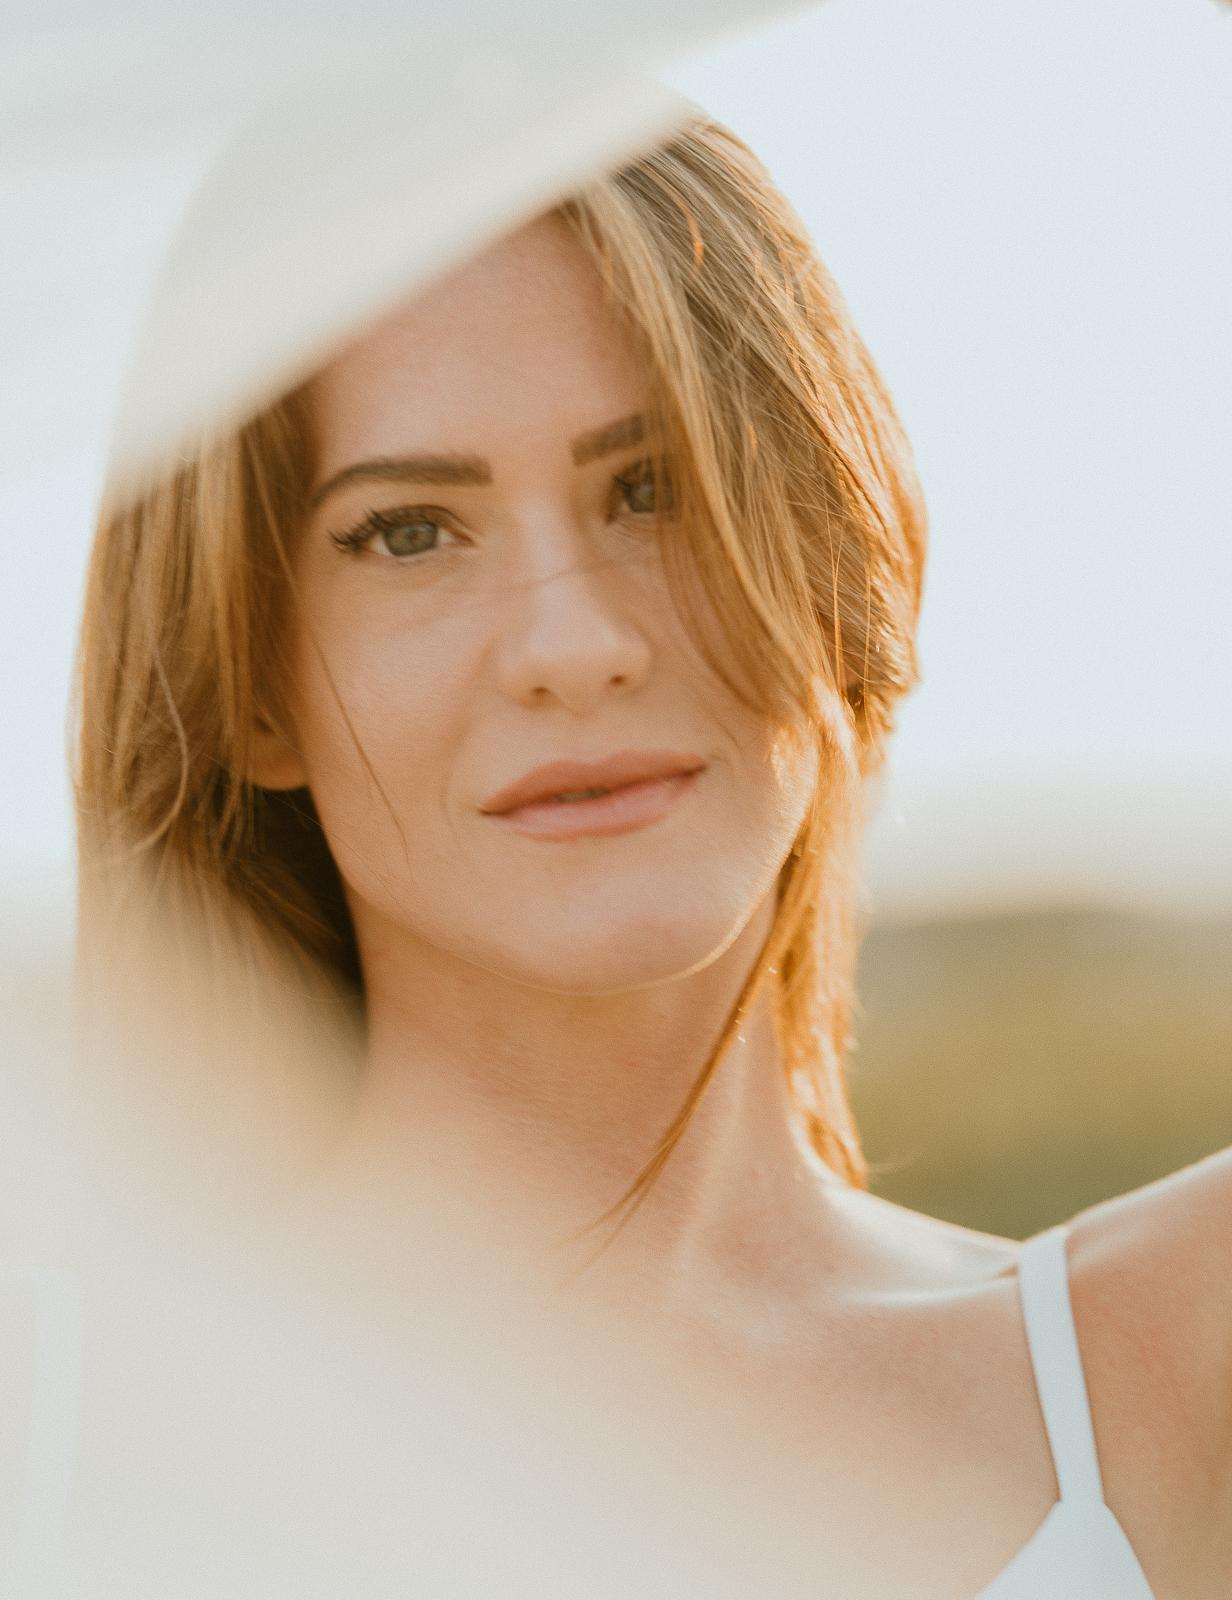 Claire & Co Bridal Editorial Portraits in Coronado CA